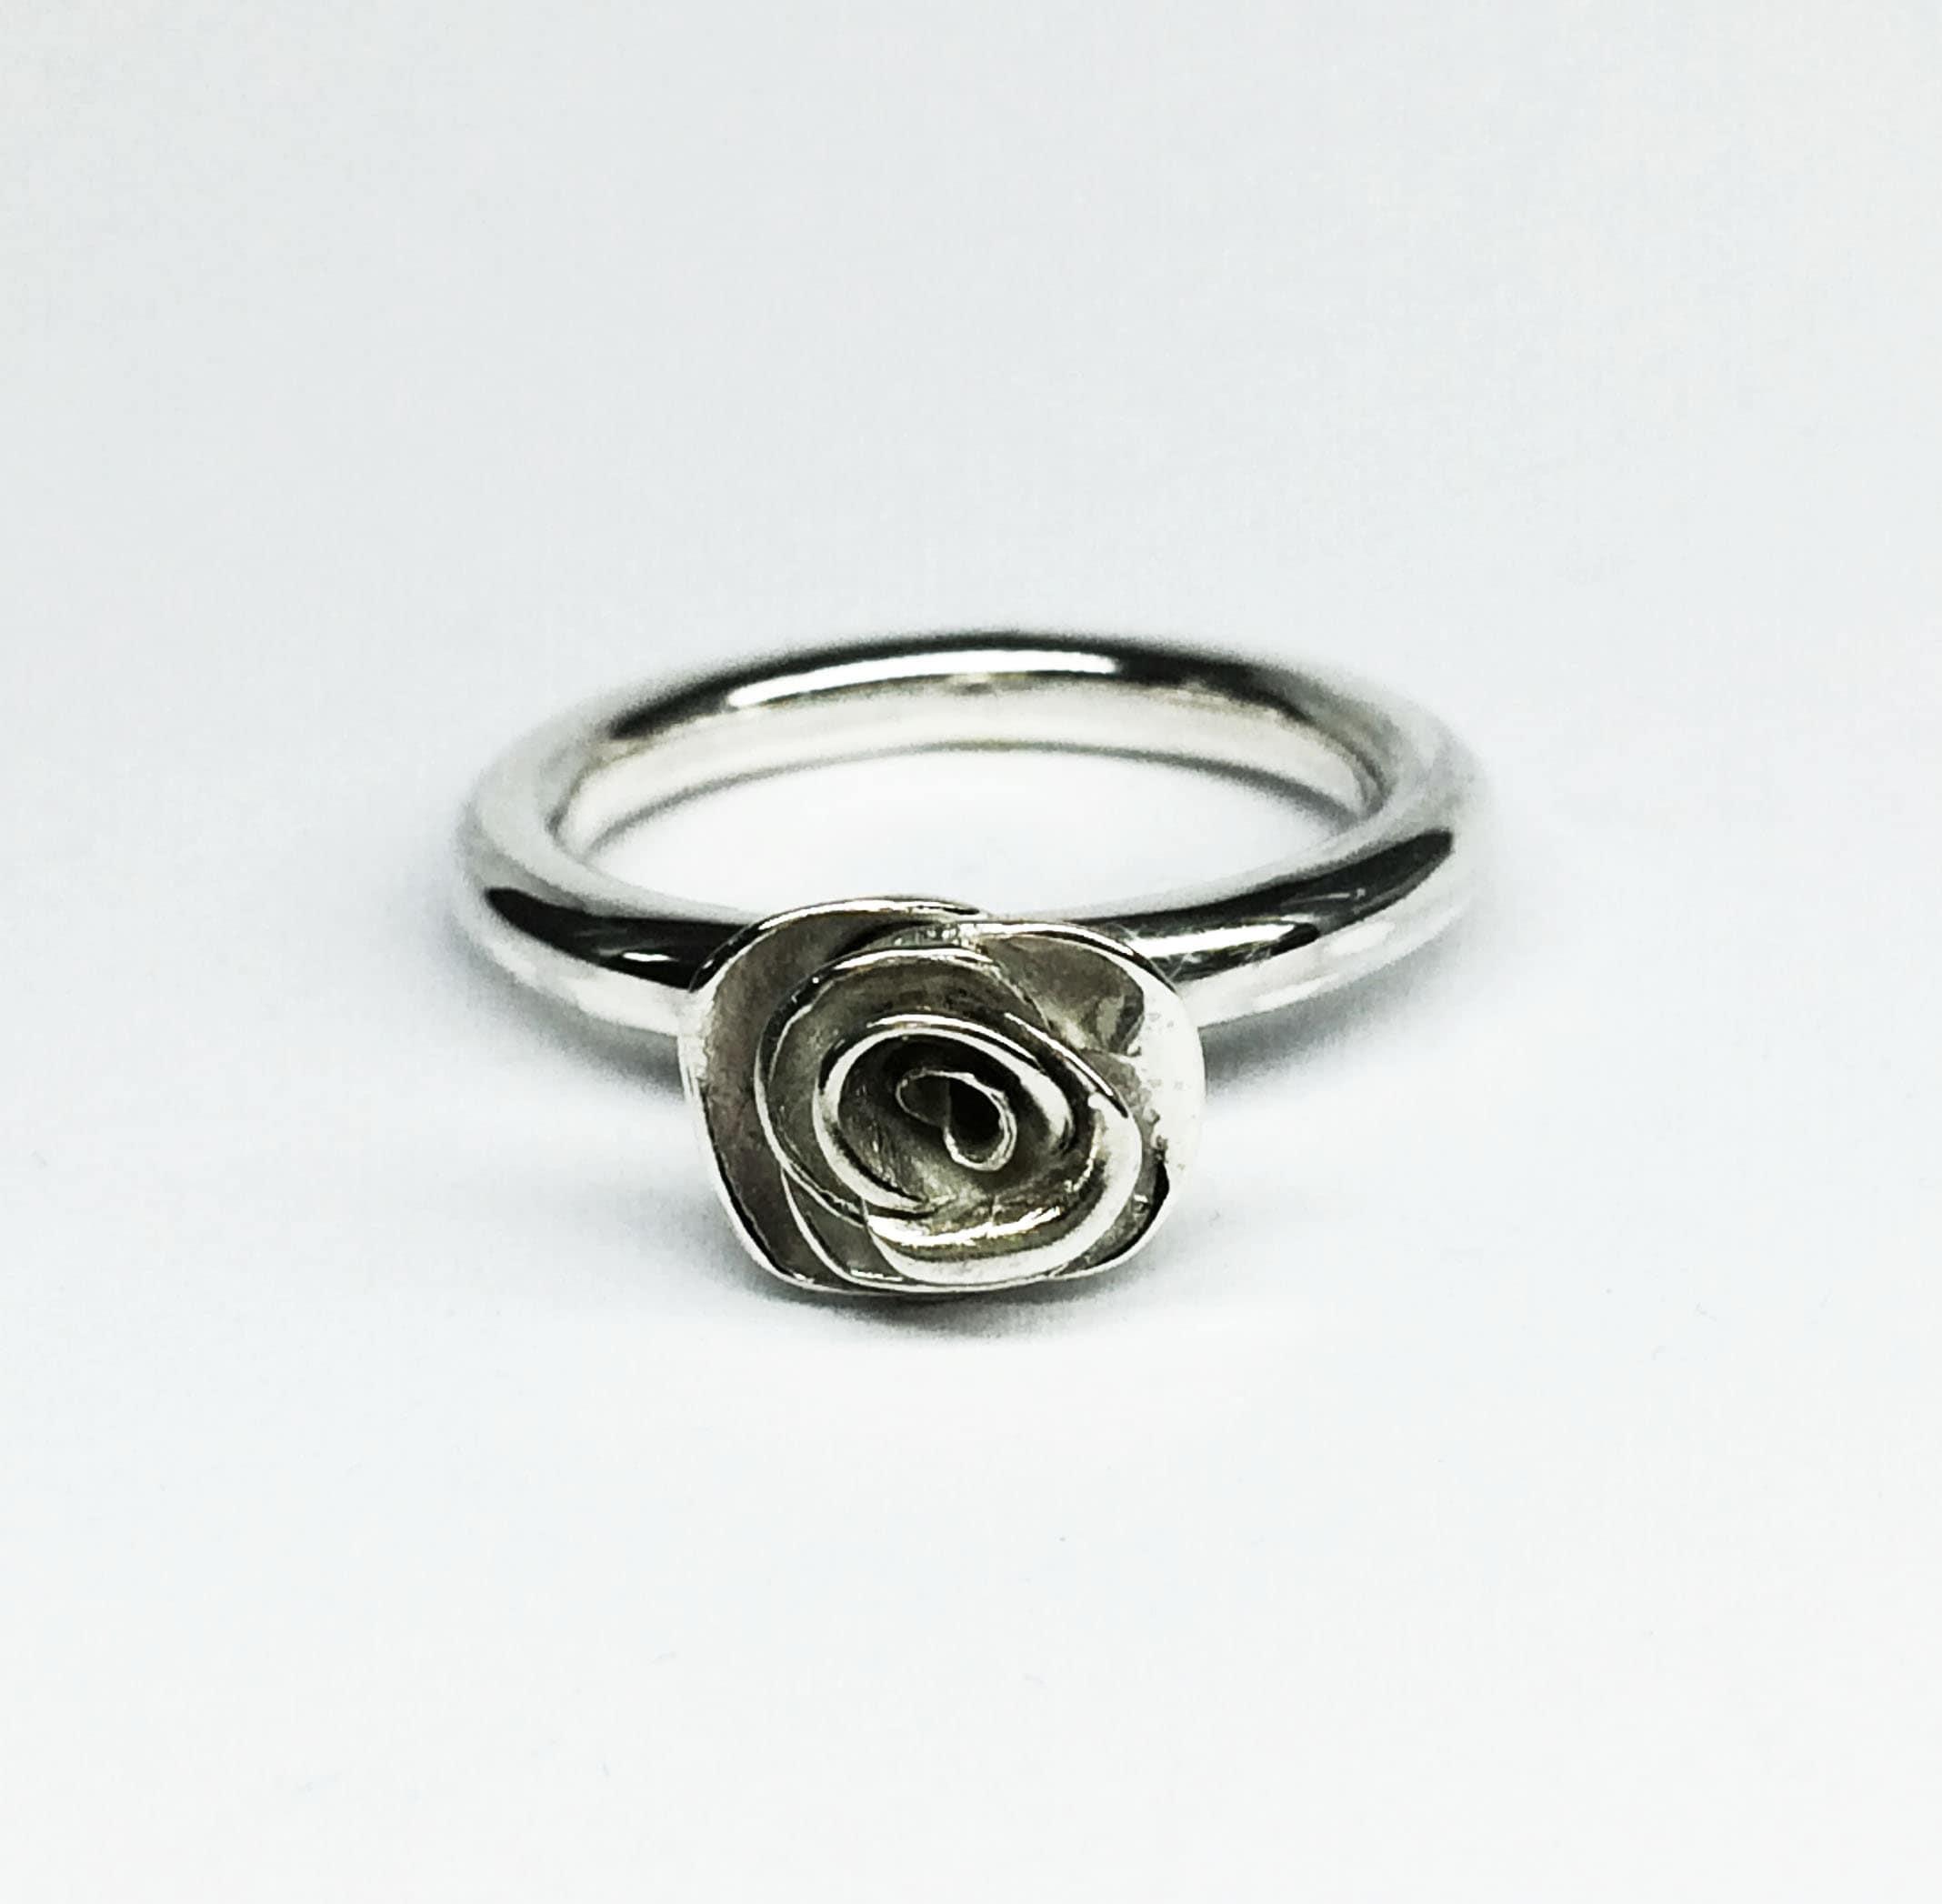 50: Silver Rose Ring Wedding At Websimilar.org